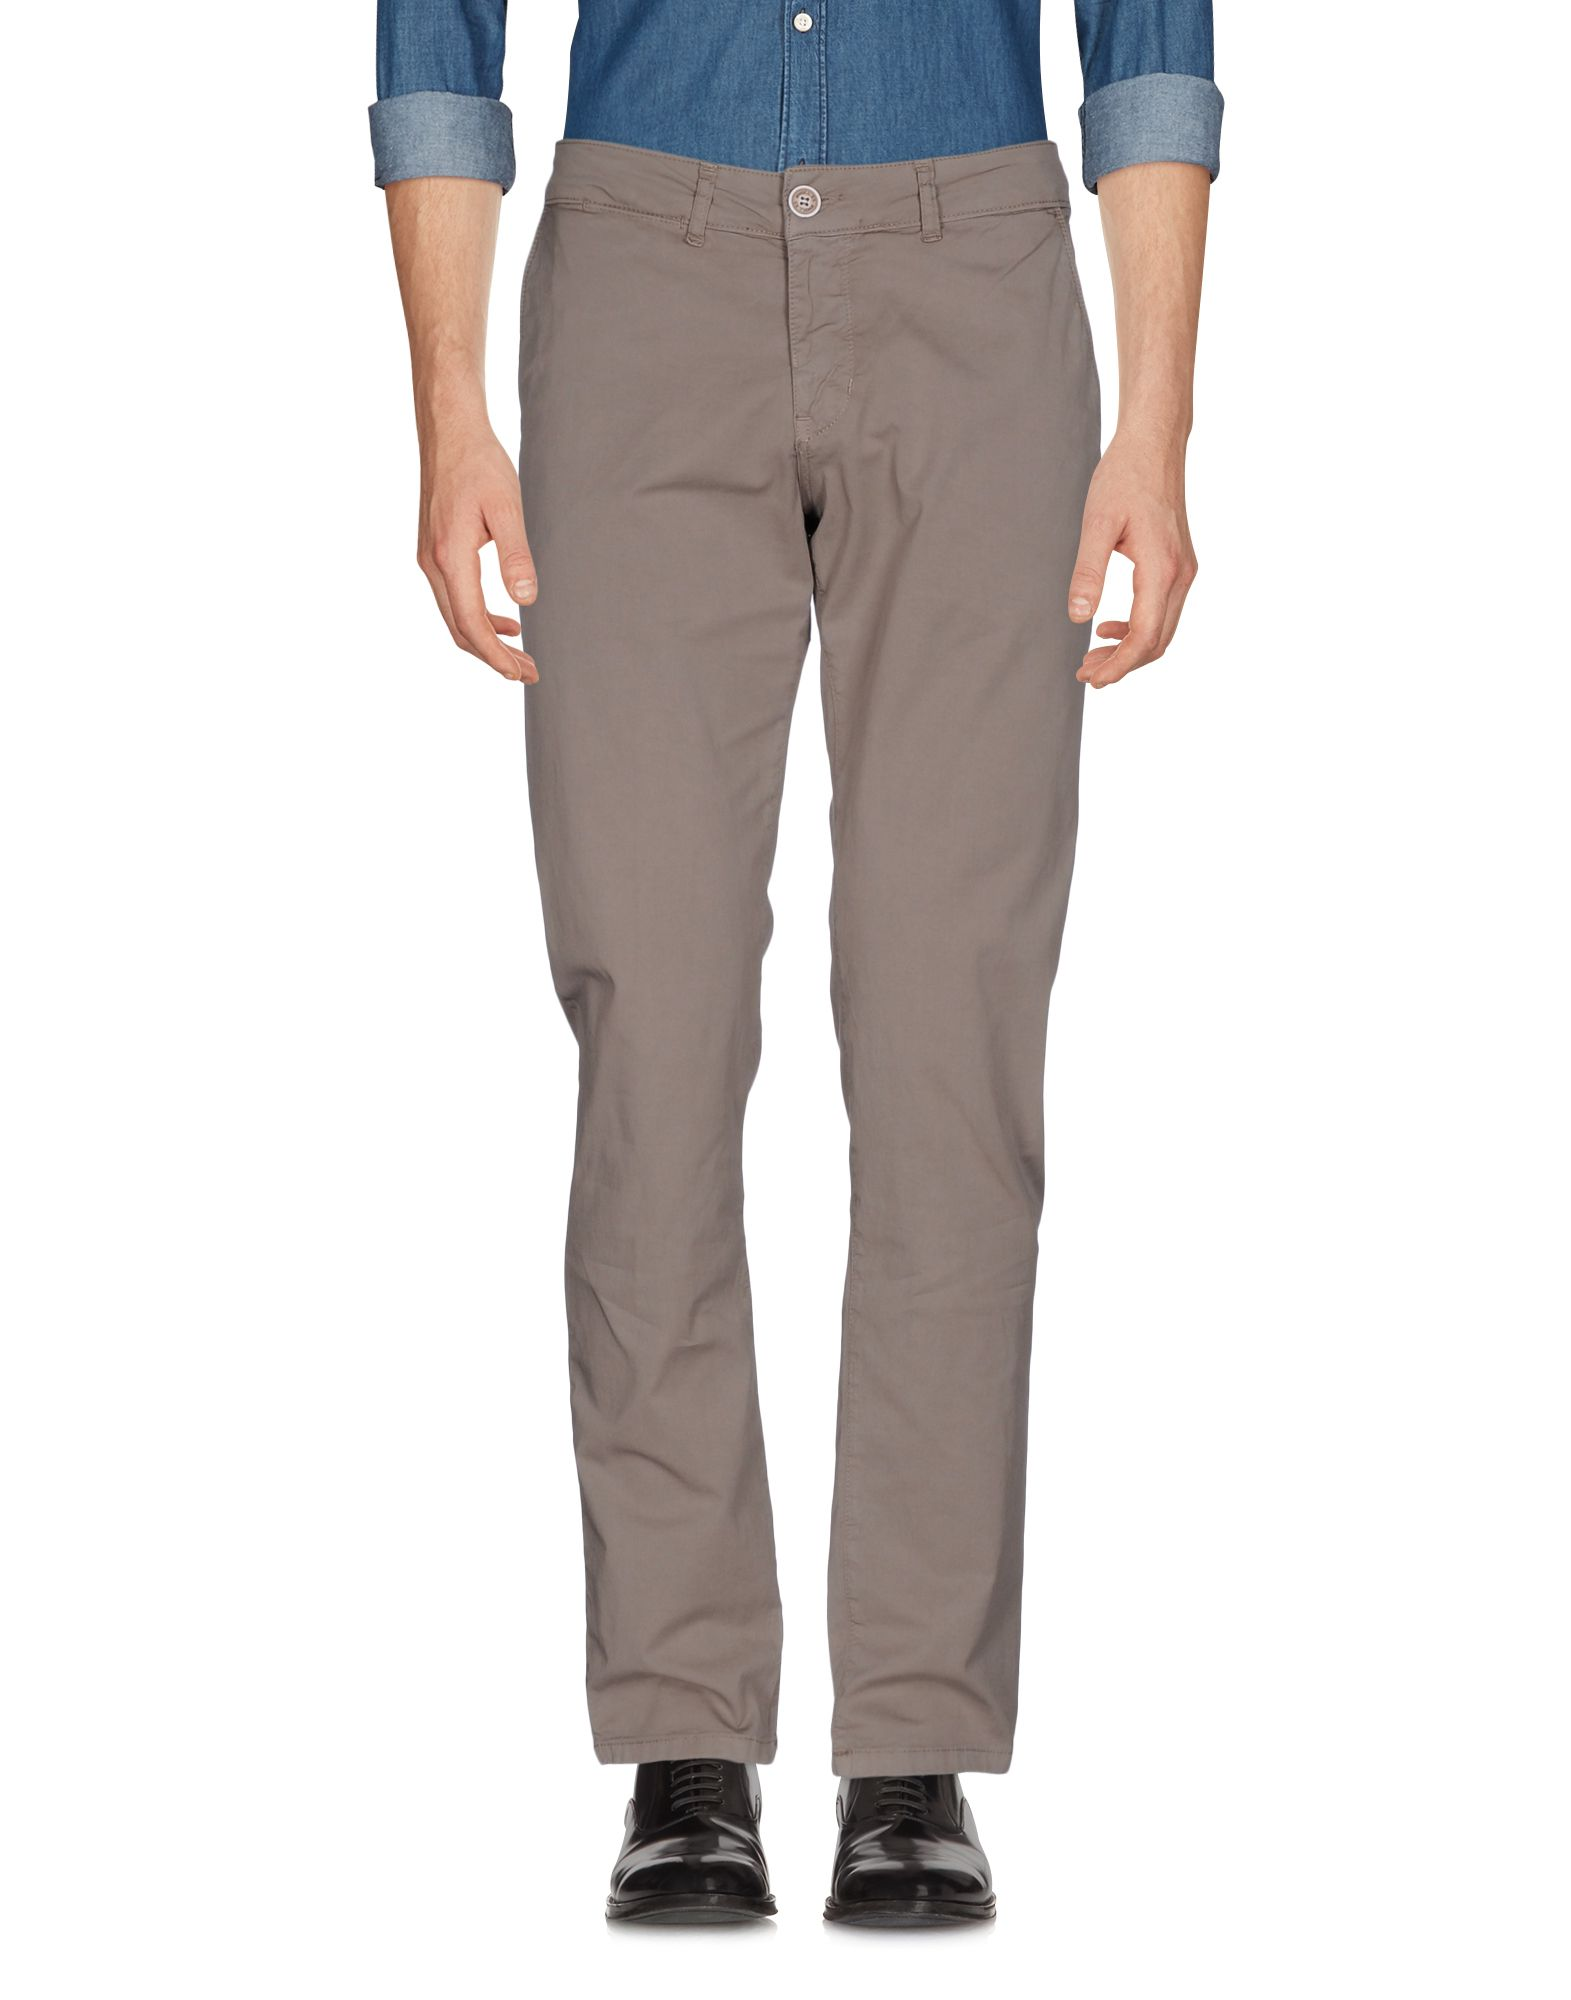 SWELL 65 Повседневные брюки брюки сноубордические цена 1500